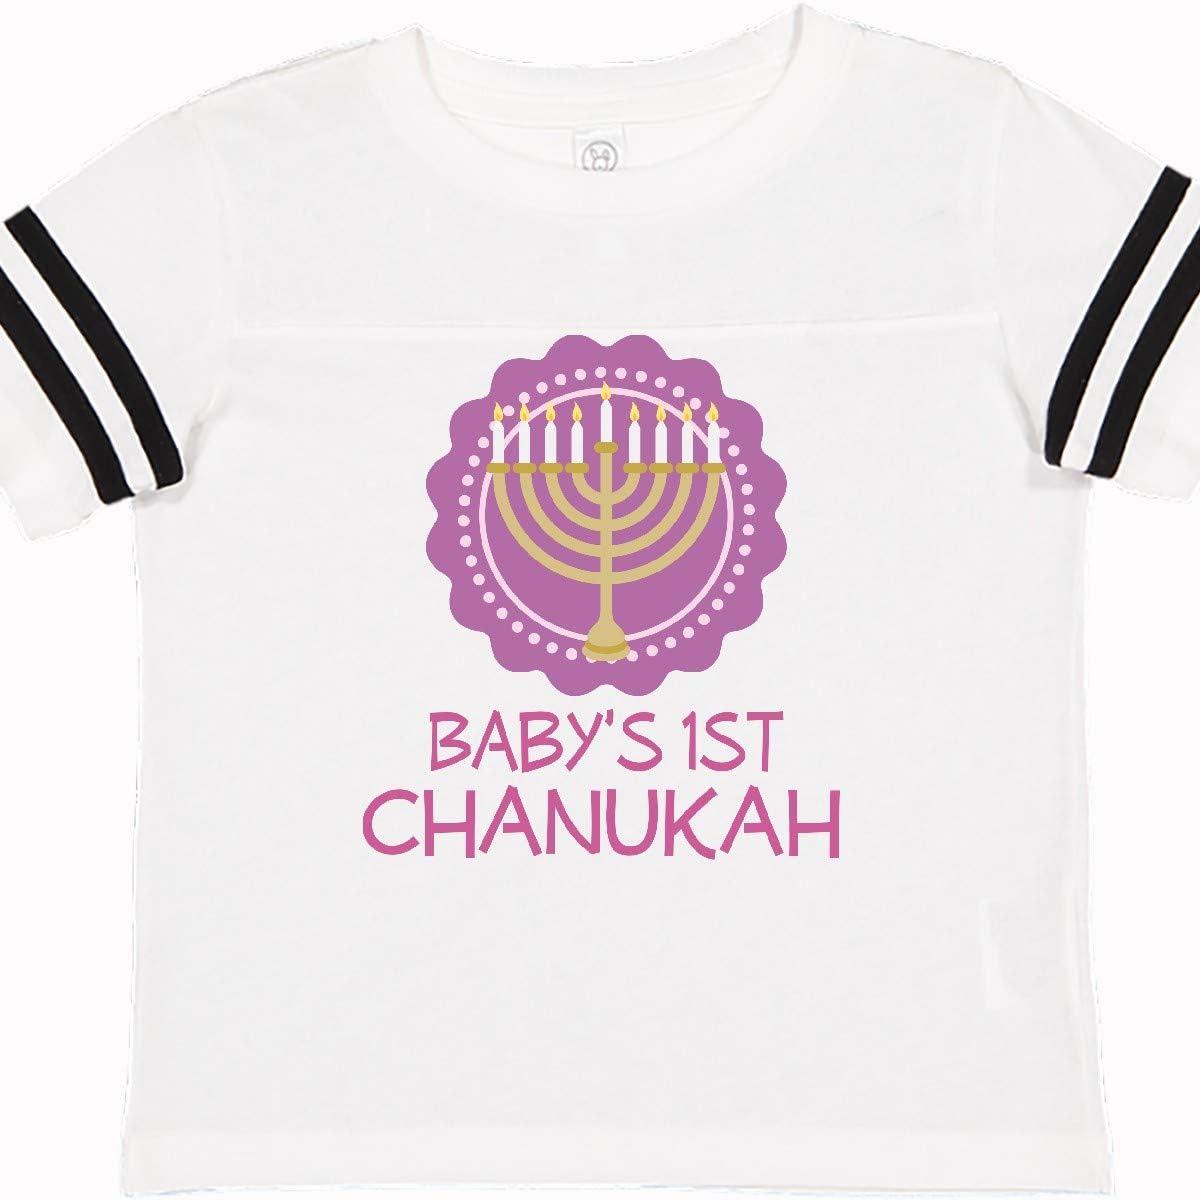 inktastic Babys 1st Chanukah Toddler T-Shirt